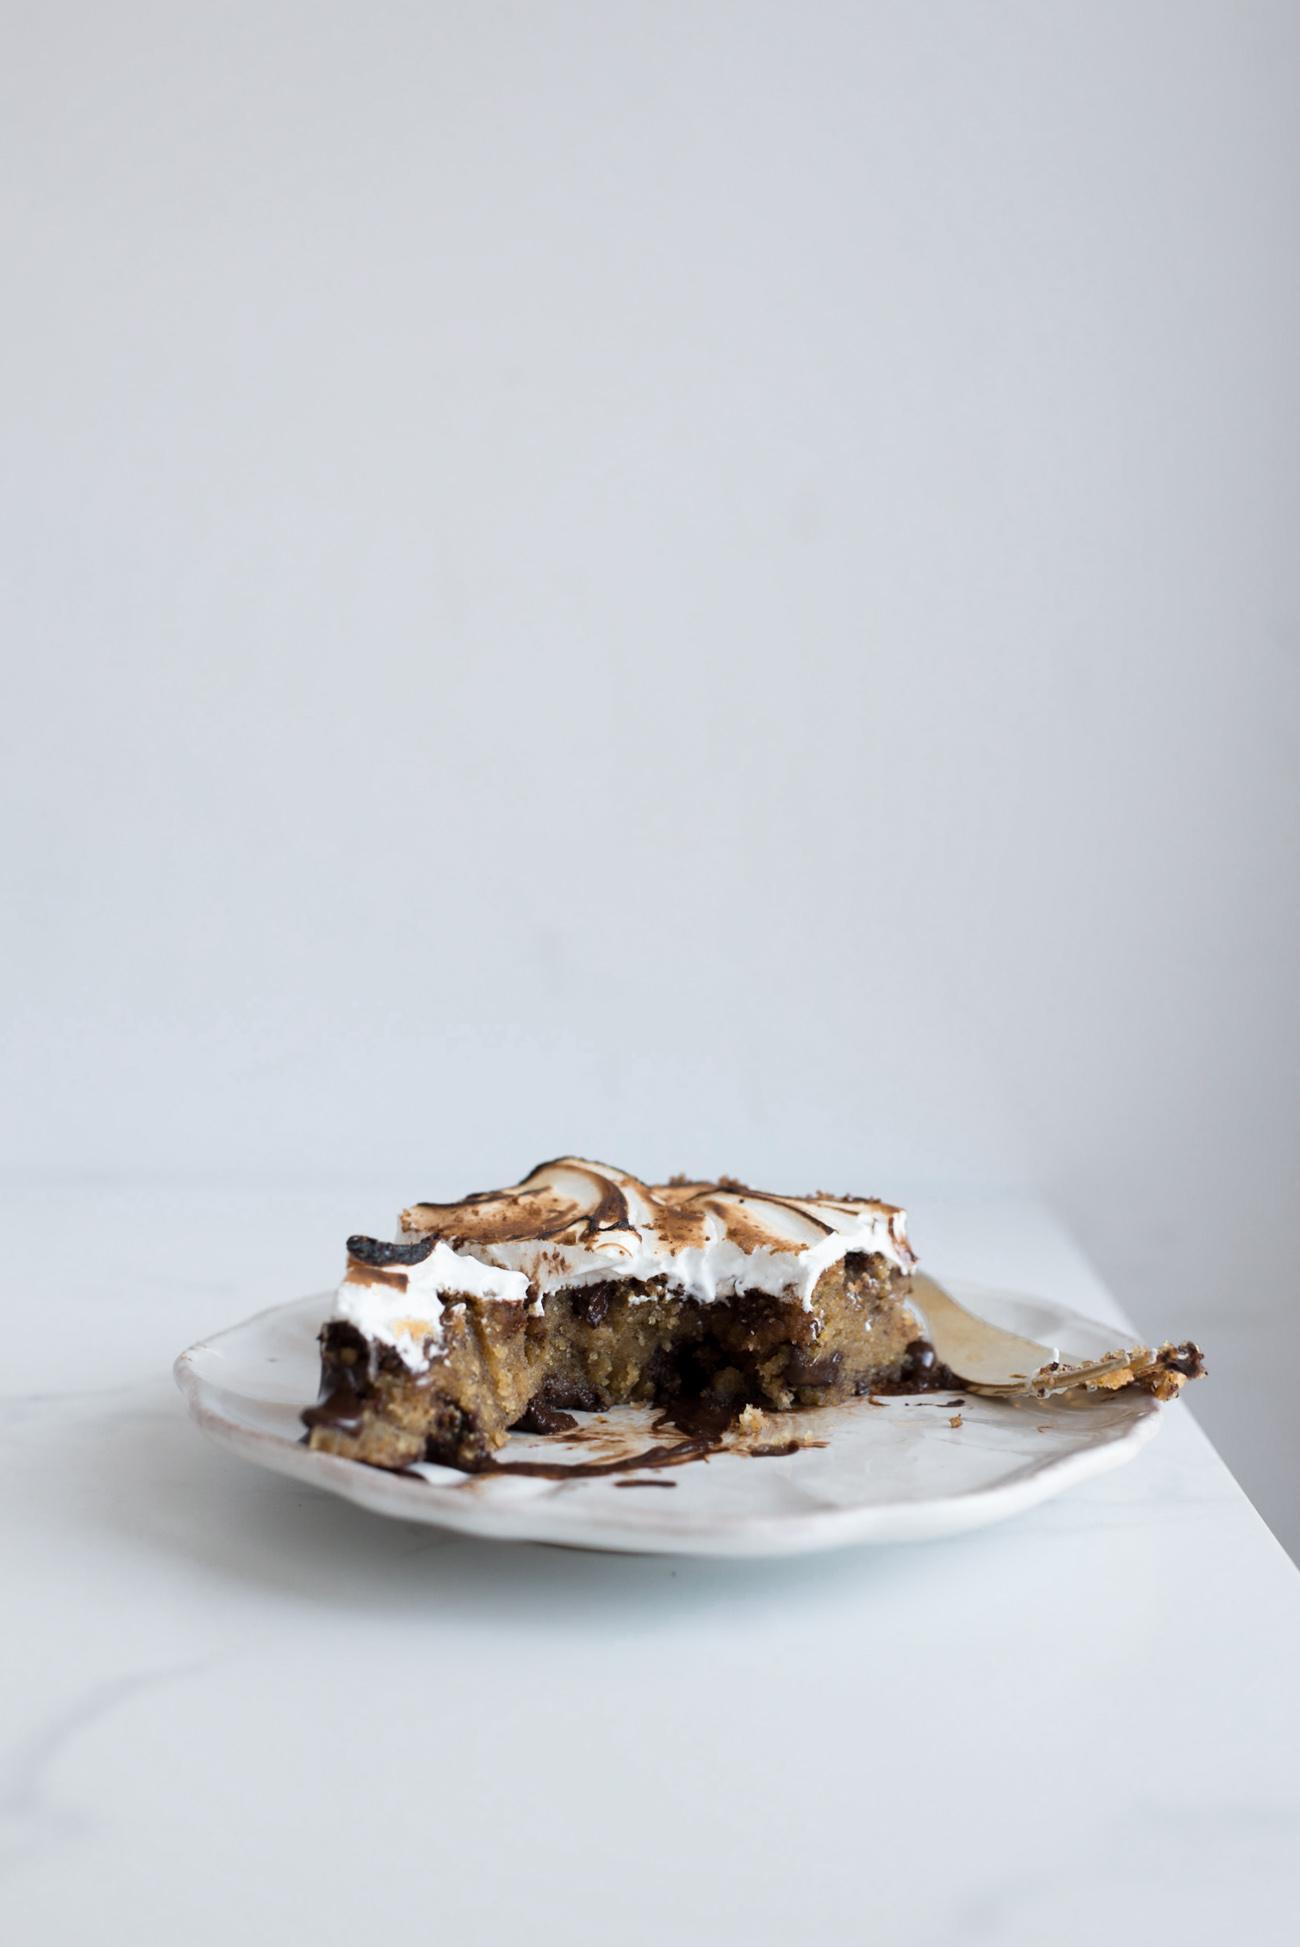 Brown-Butter-Cookie-Meringue-Bars-with-Espresso-Fleur-de-Sel-8.jpg